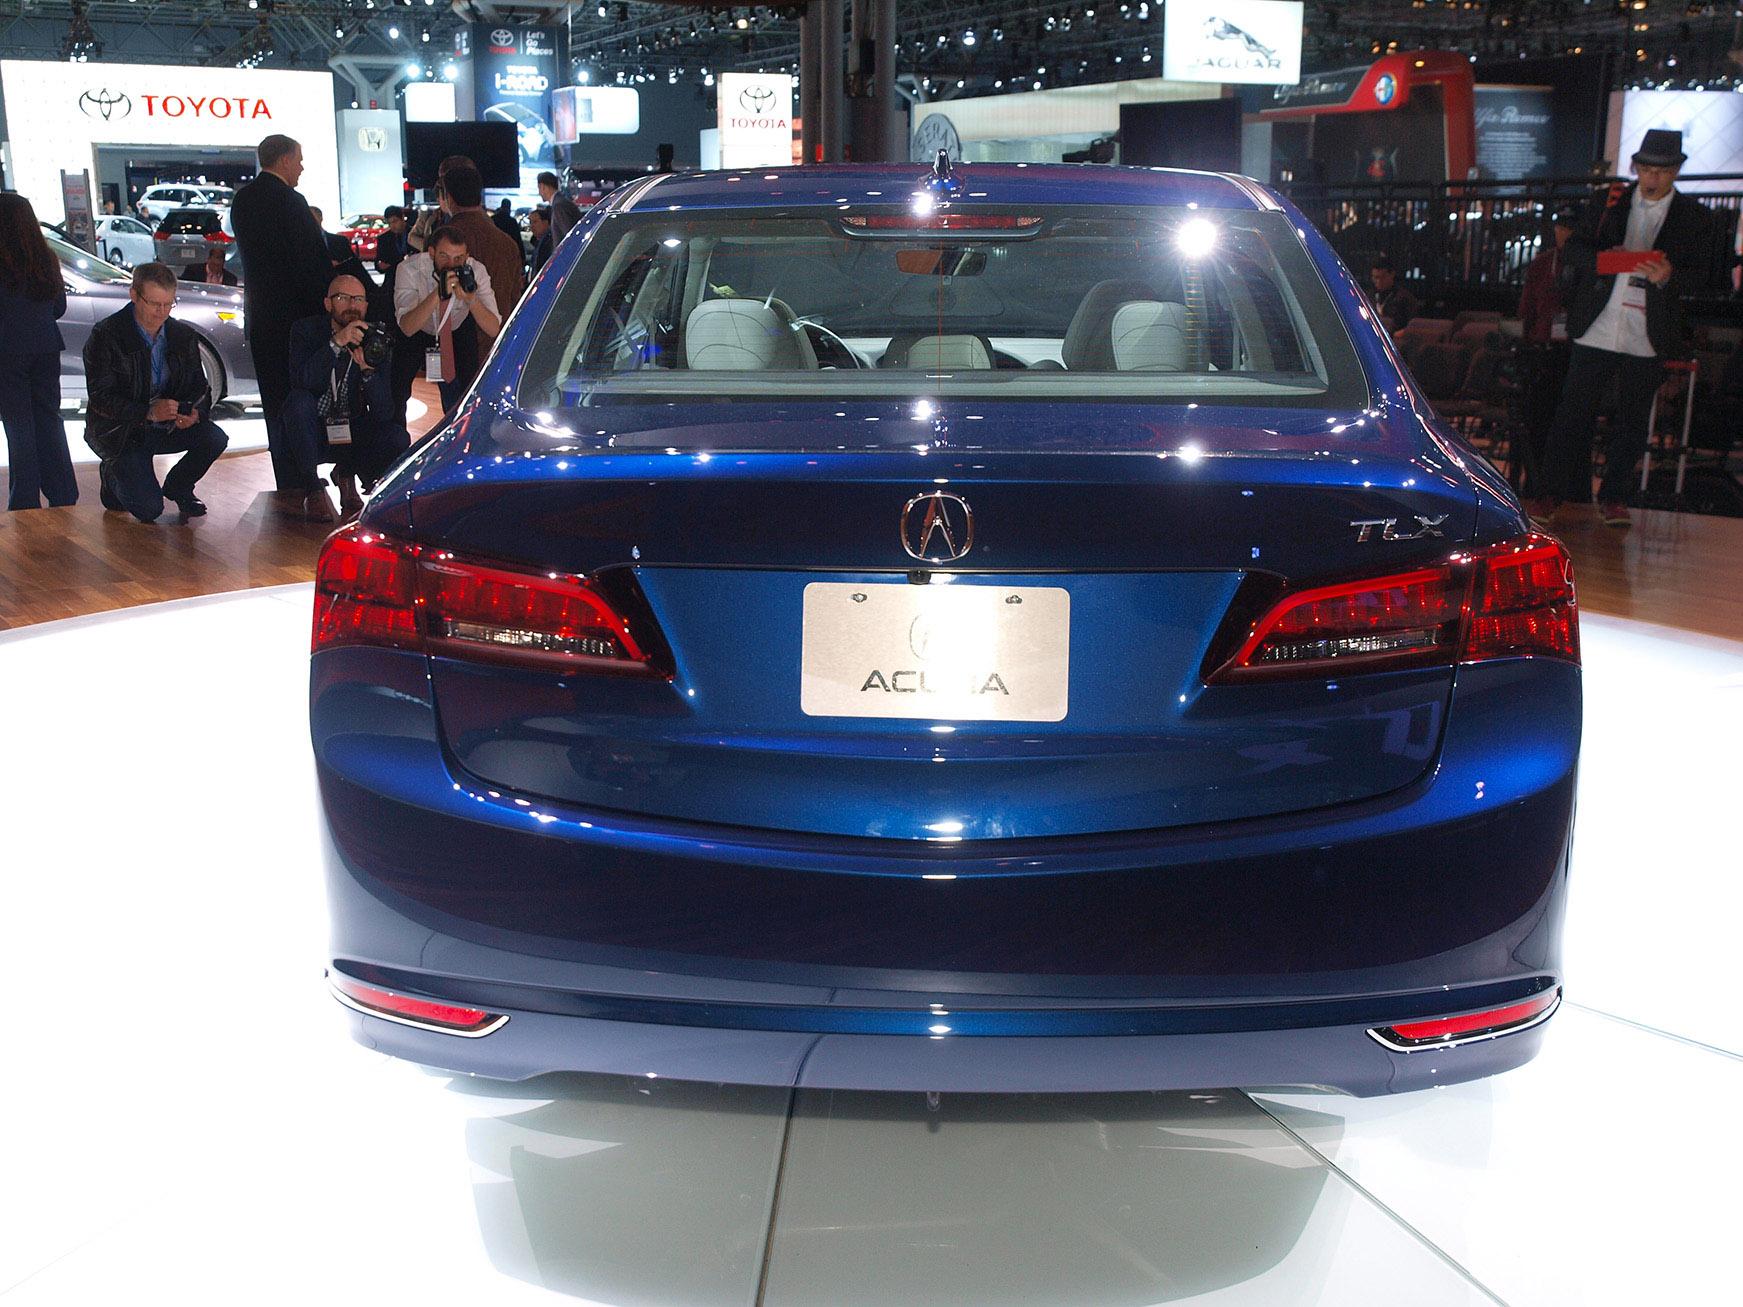 2010 Acura TLX Concept photo - 1